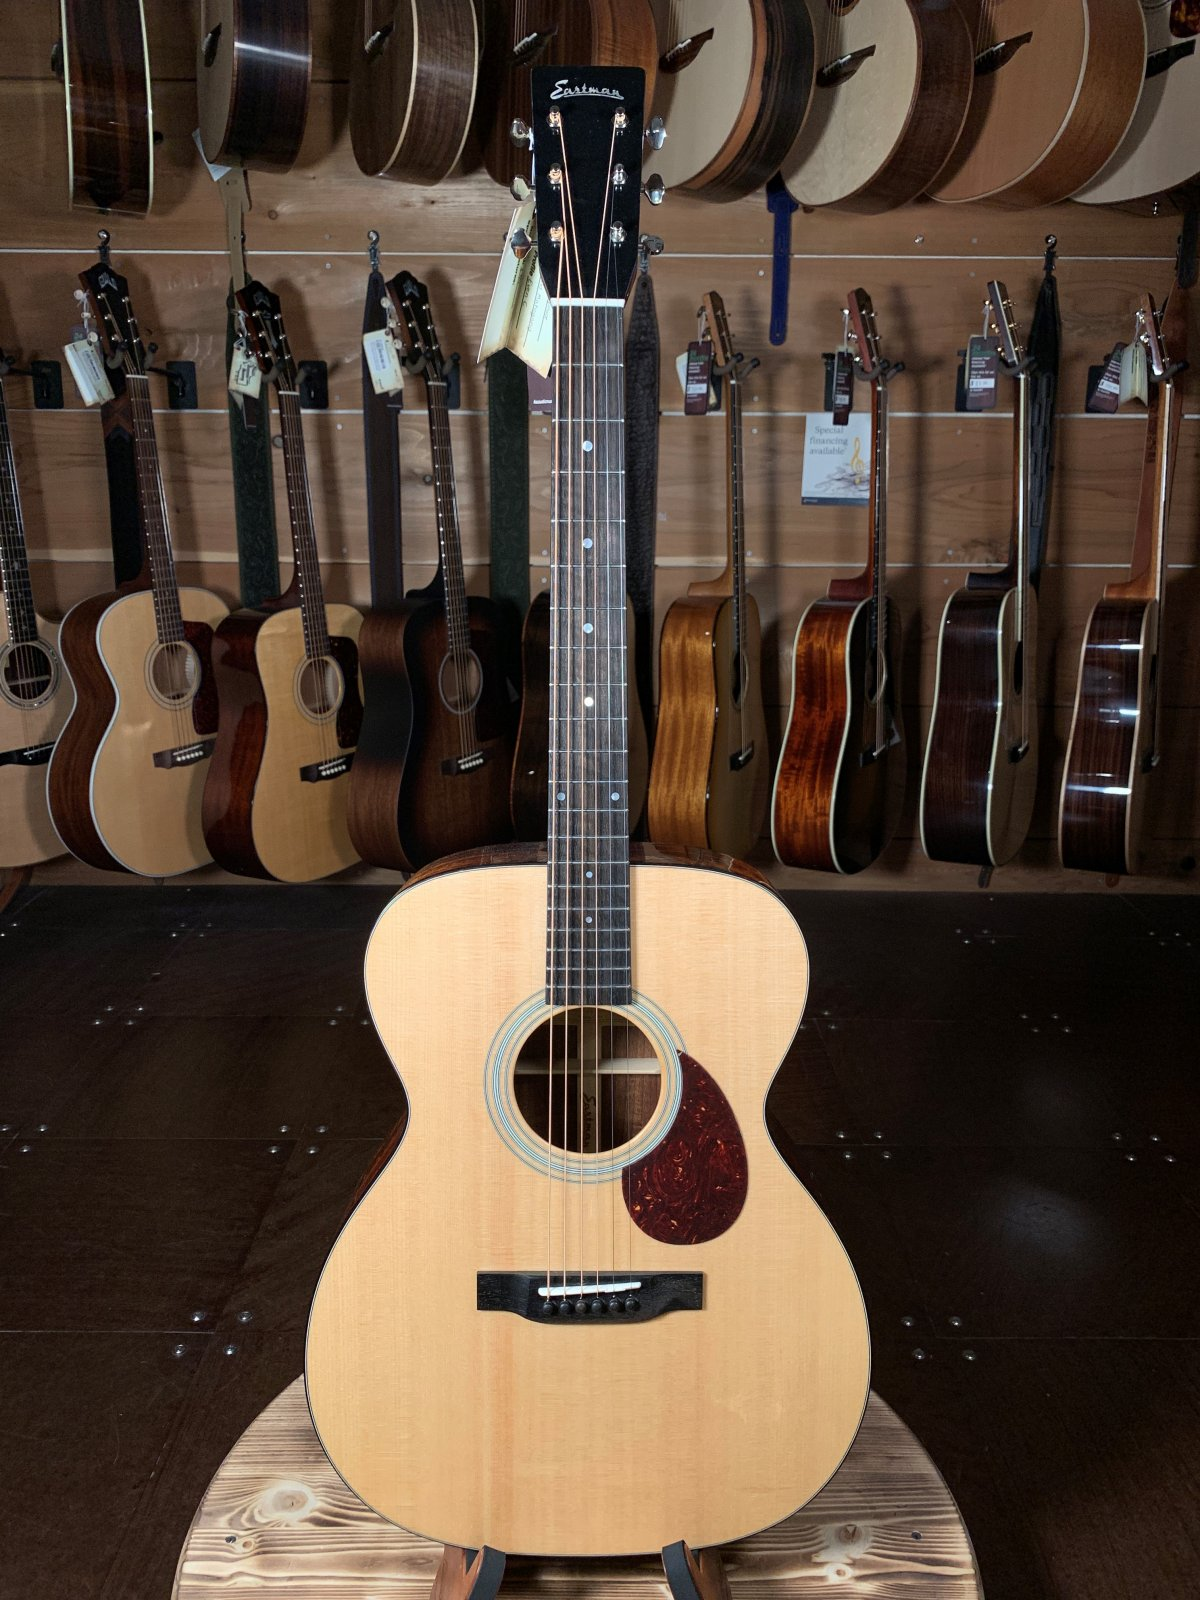 Eastman E6OM Natural Spruce/Mahogany Acoustic #6278